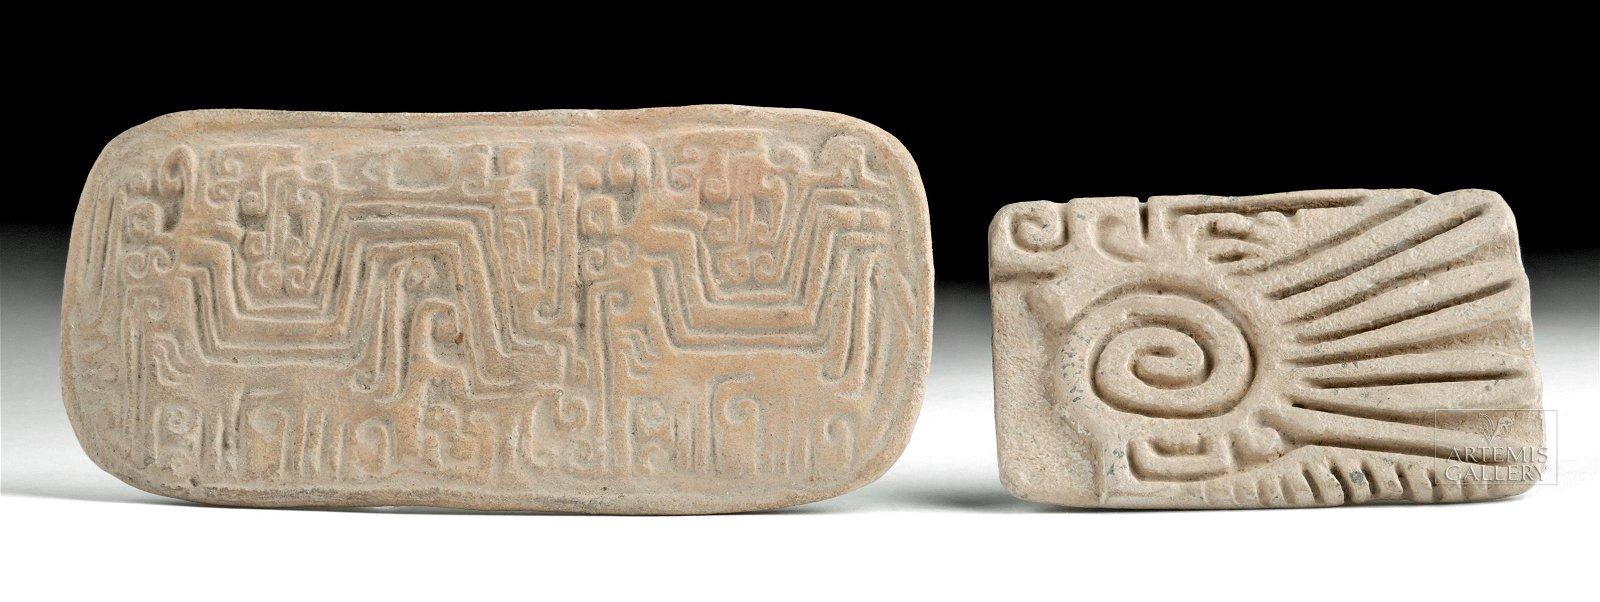 Lot of 2 Chorrera & Jamacoaque Pottery Stamp Seals